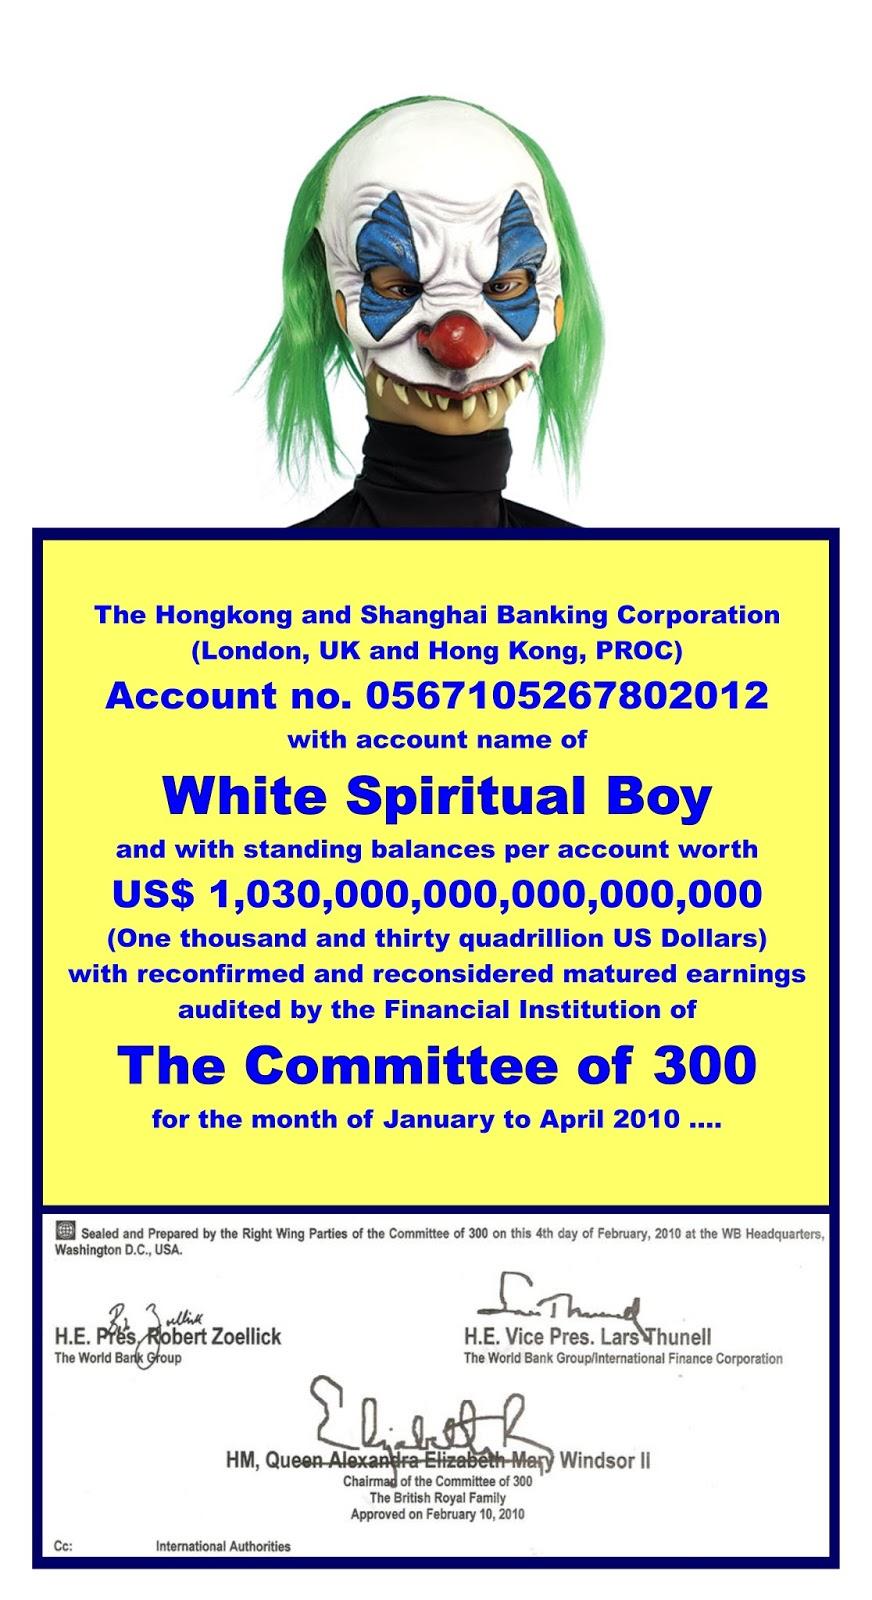 http://alcuinbramerton.blogspot.com/2012/01/white-spiritual-boy-off-ledger-black.html